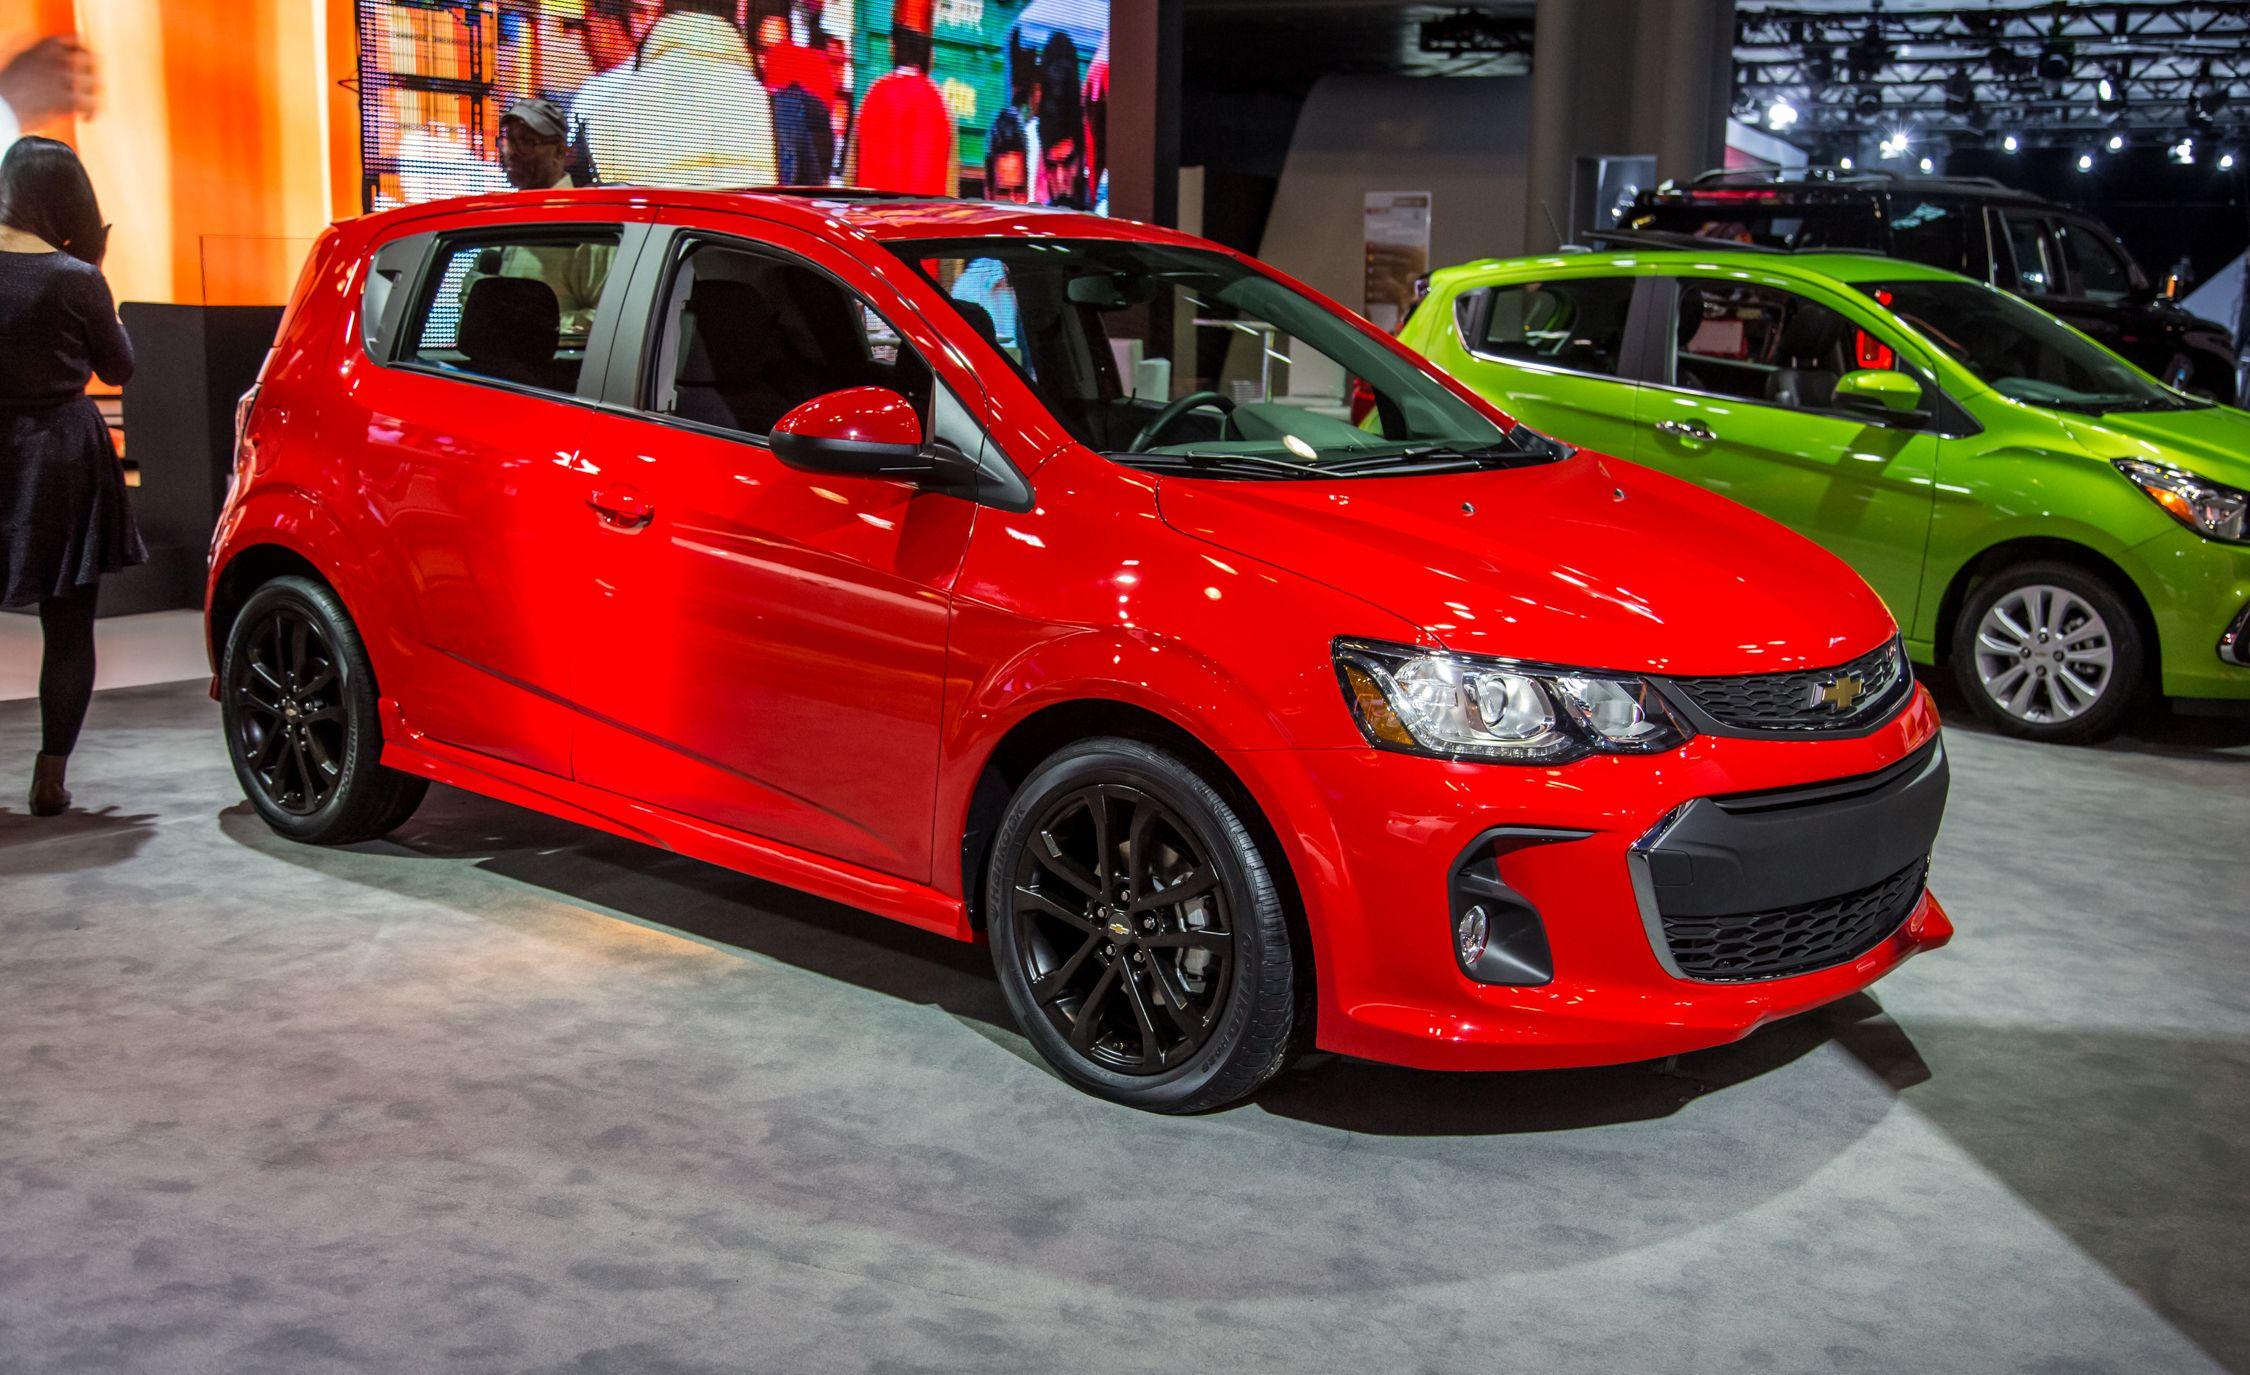 2017 Chevrolet Sonic: Fresh Looks, New Tech